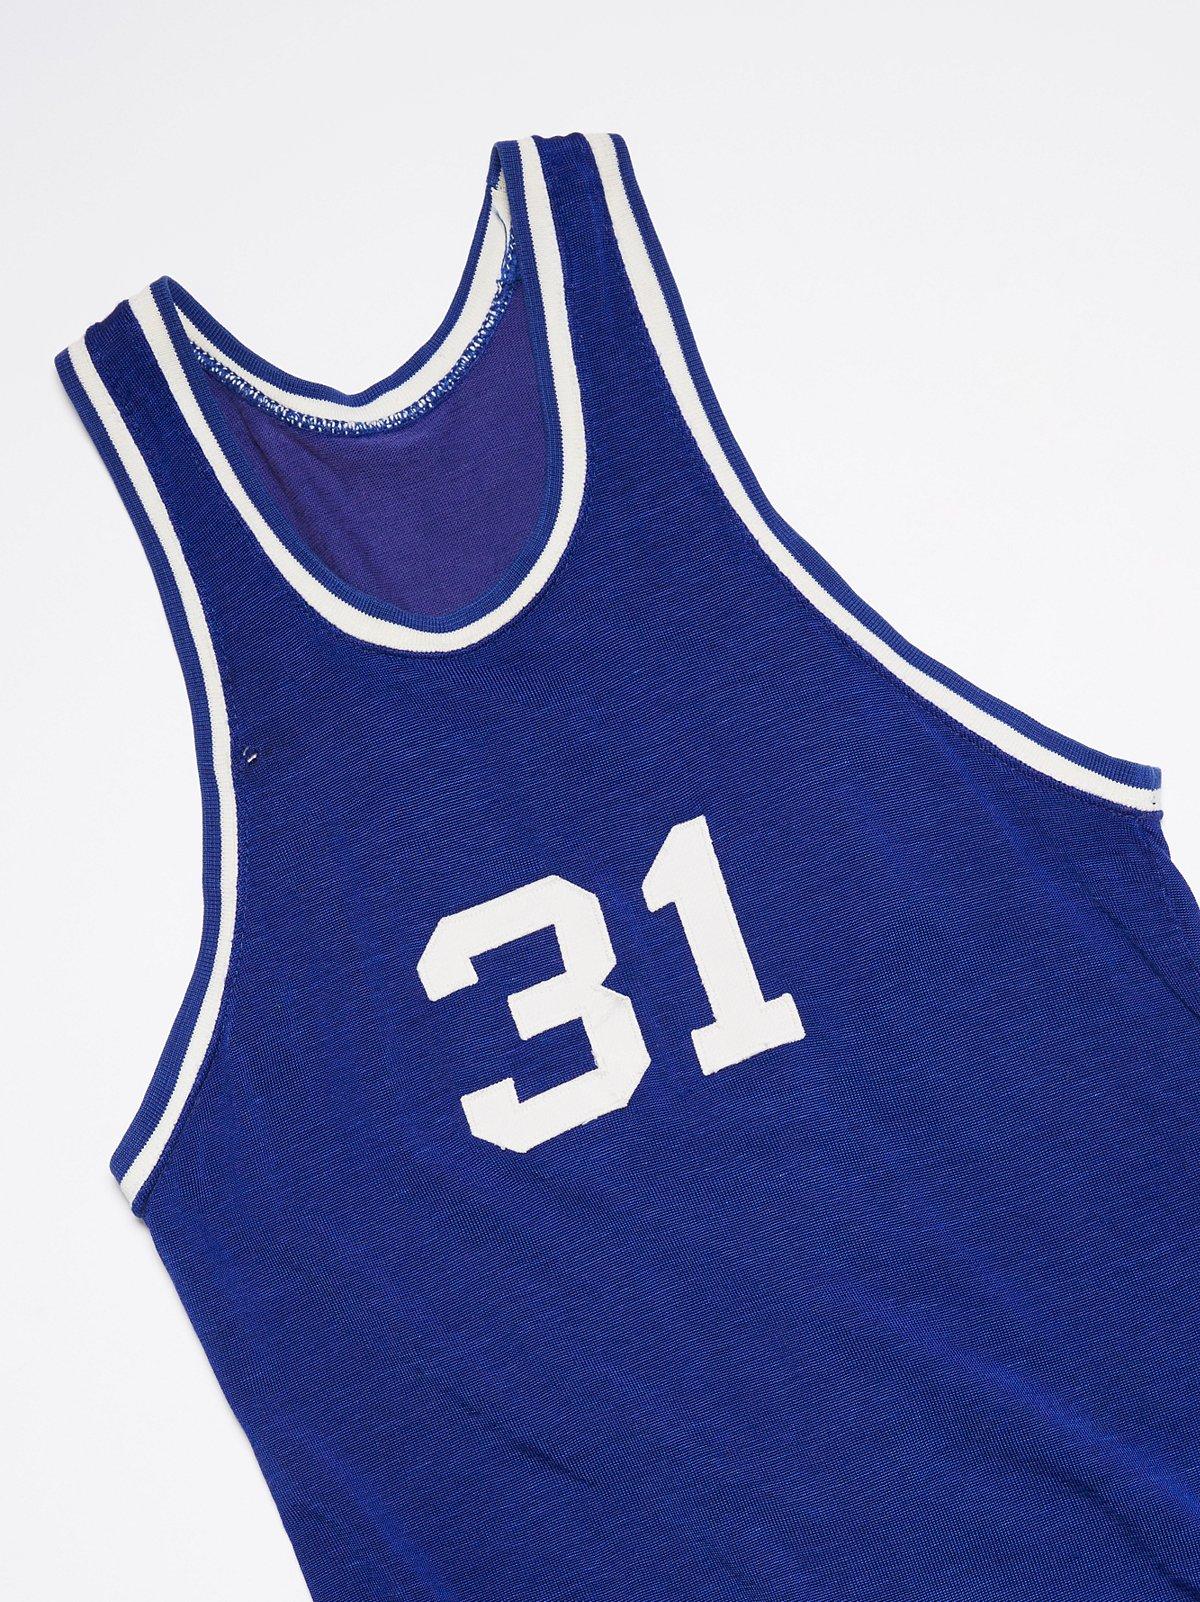 Vintage 1960s #31 Jersey